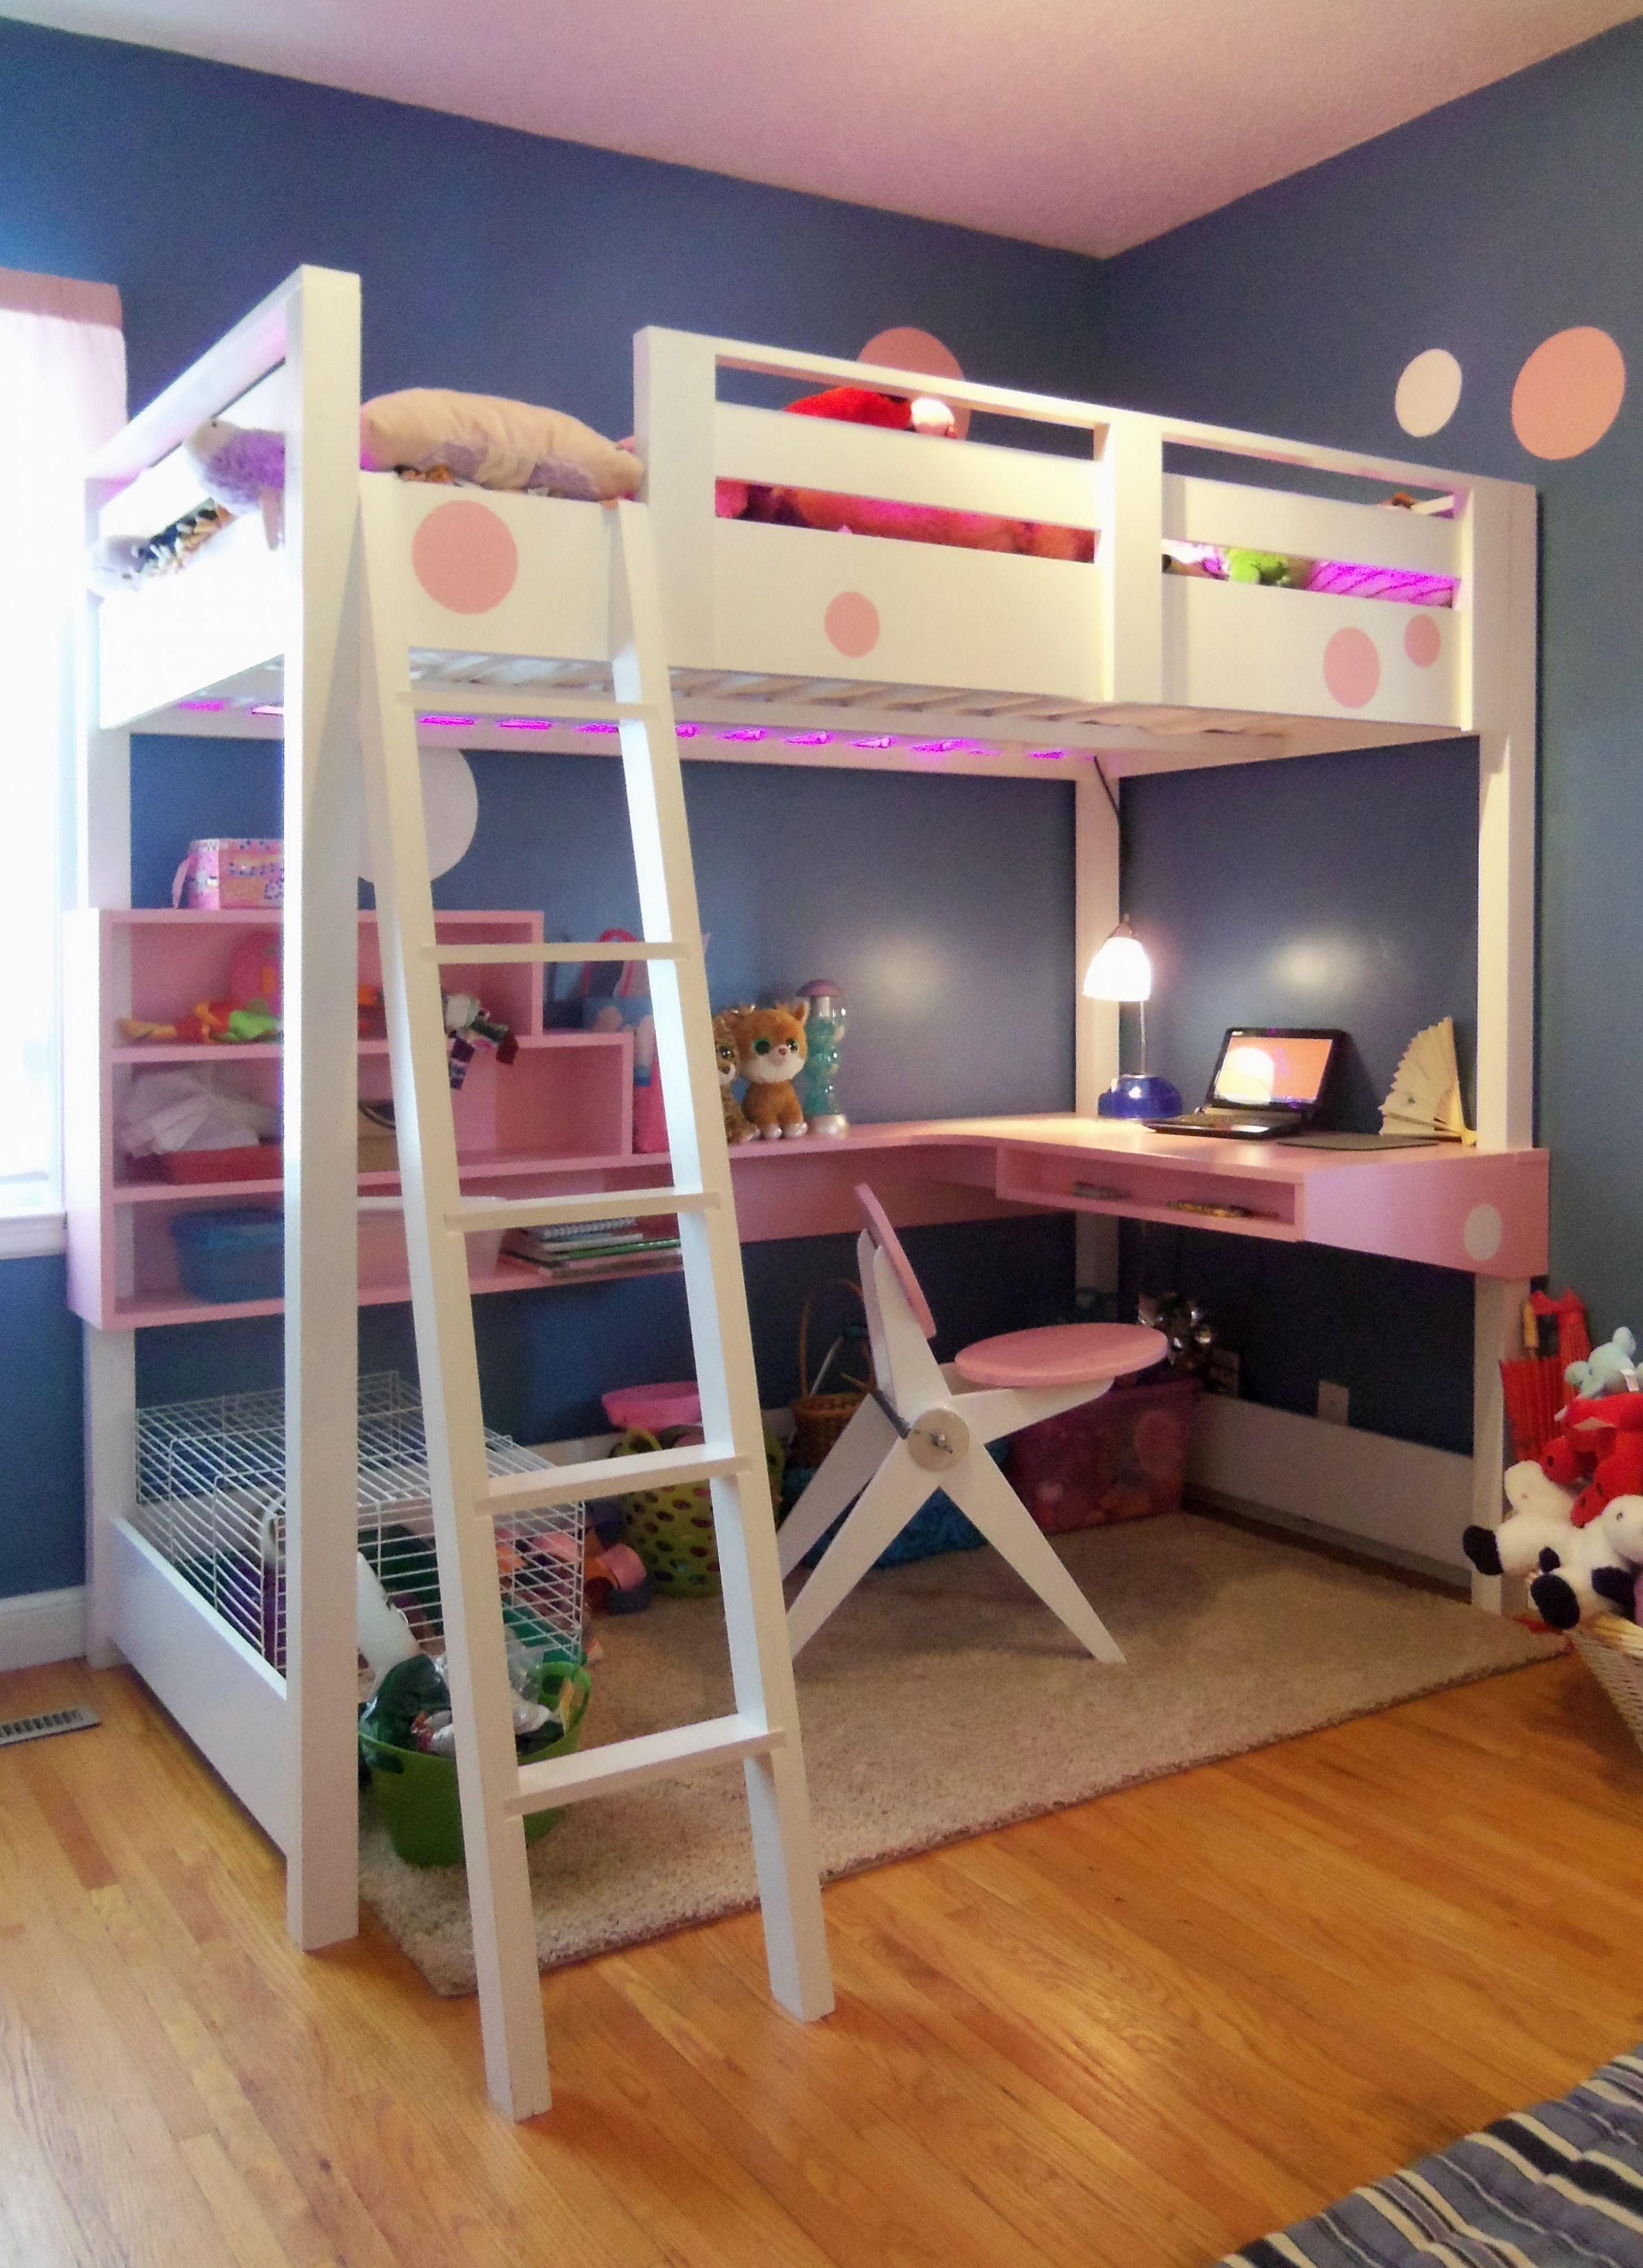 Diy Loft Bed With Desk Living Spaces Living Room Sets Check More At Http Www Gameintown Cama Beliche Decoracao De Quarto Tumblr Ideias Legais Para Quartos